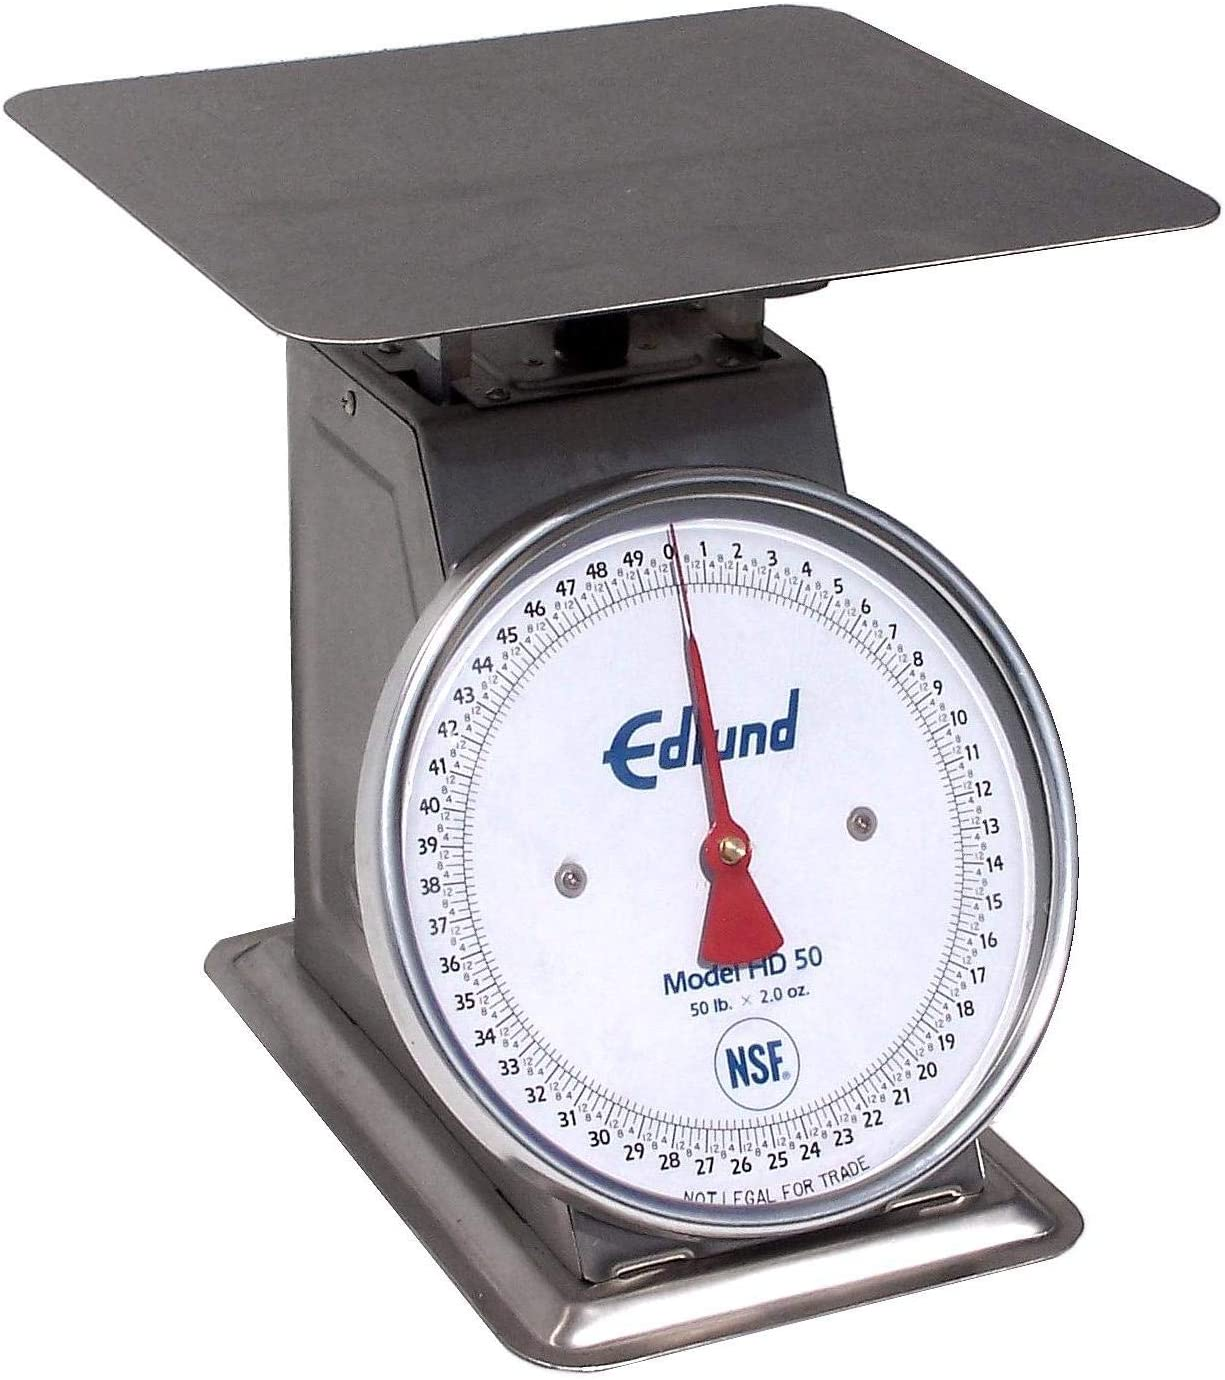 Edlund HD-50 Dial Type Portion Scale w/ Sloped Face (50 lb x 2 oz Graduation)